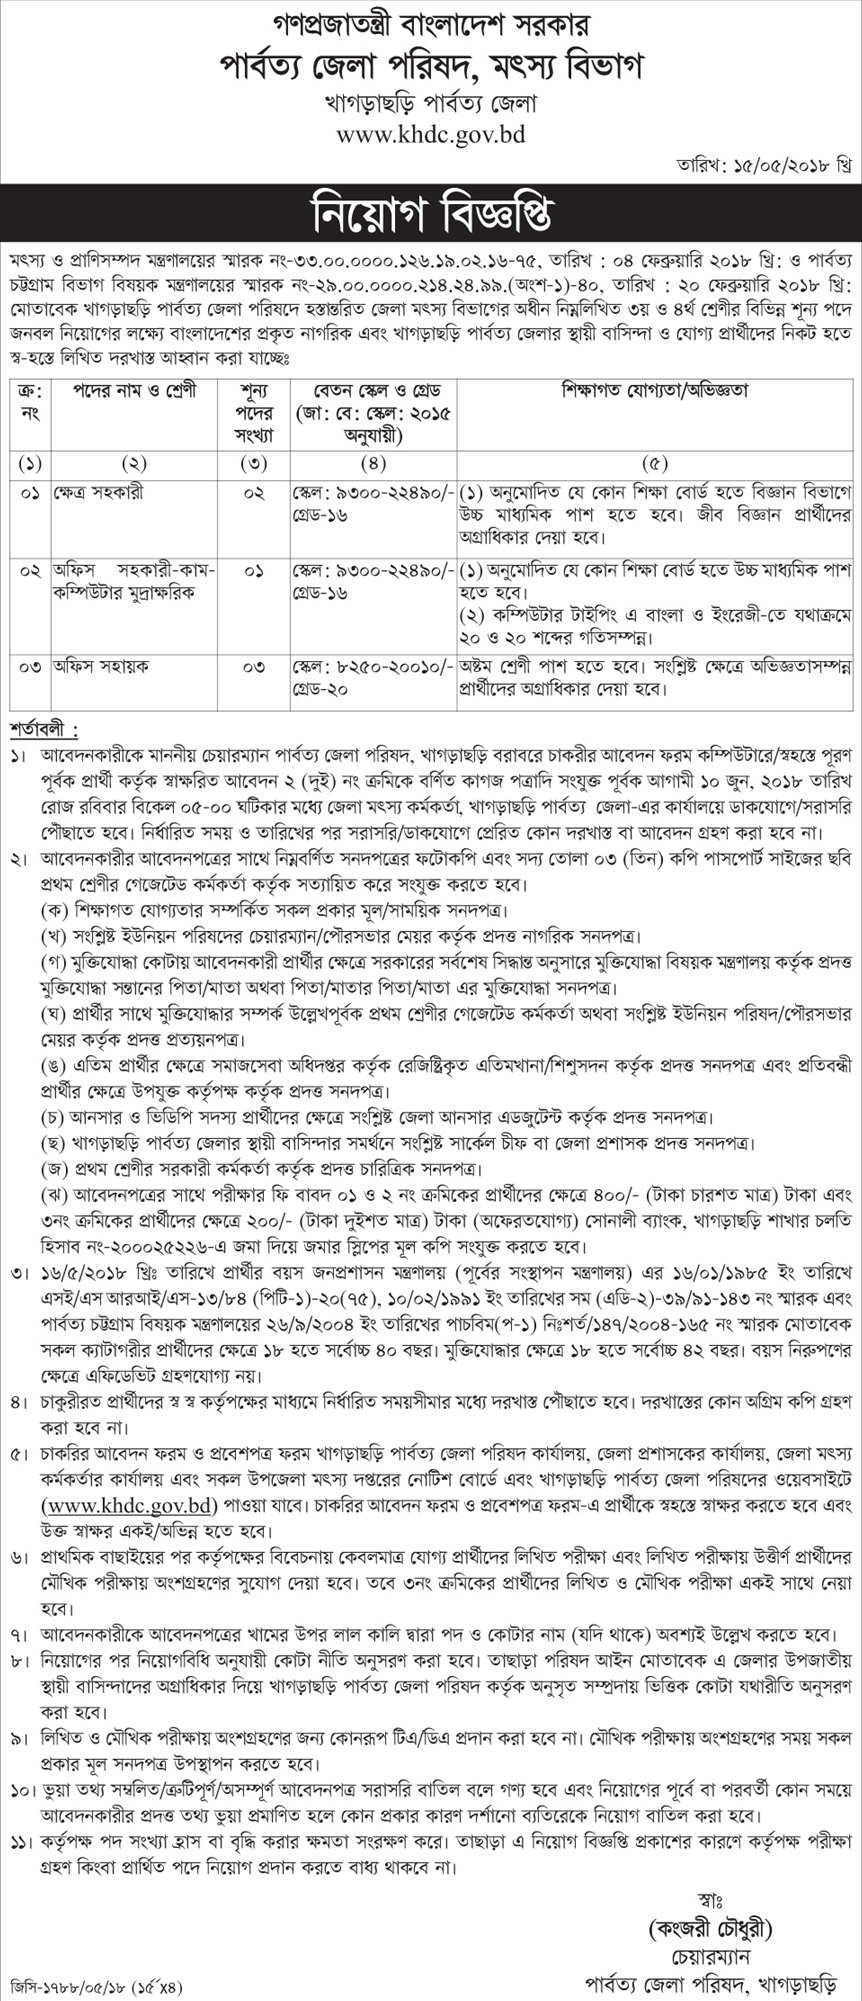 KHDC job circular